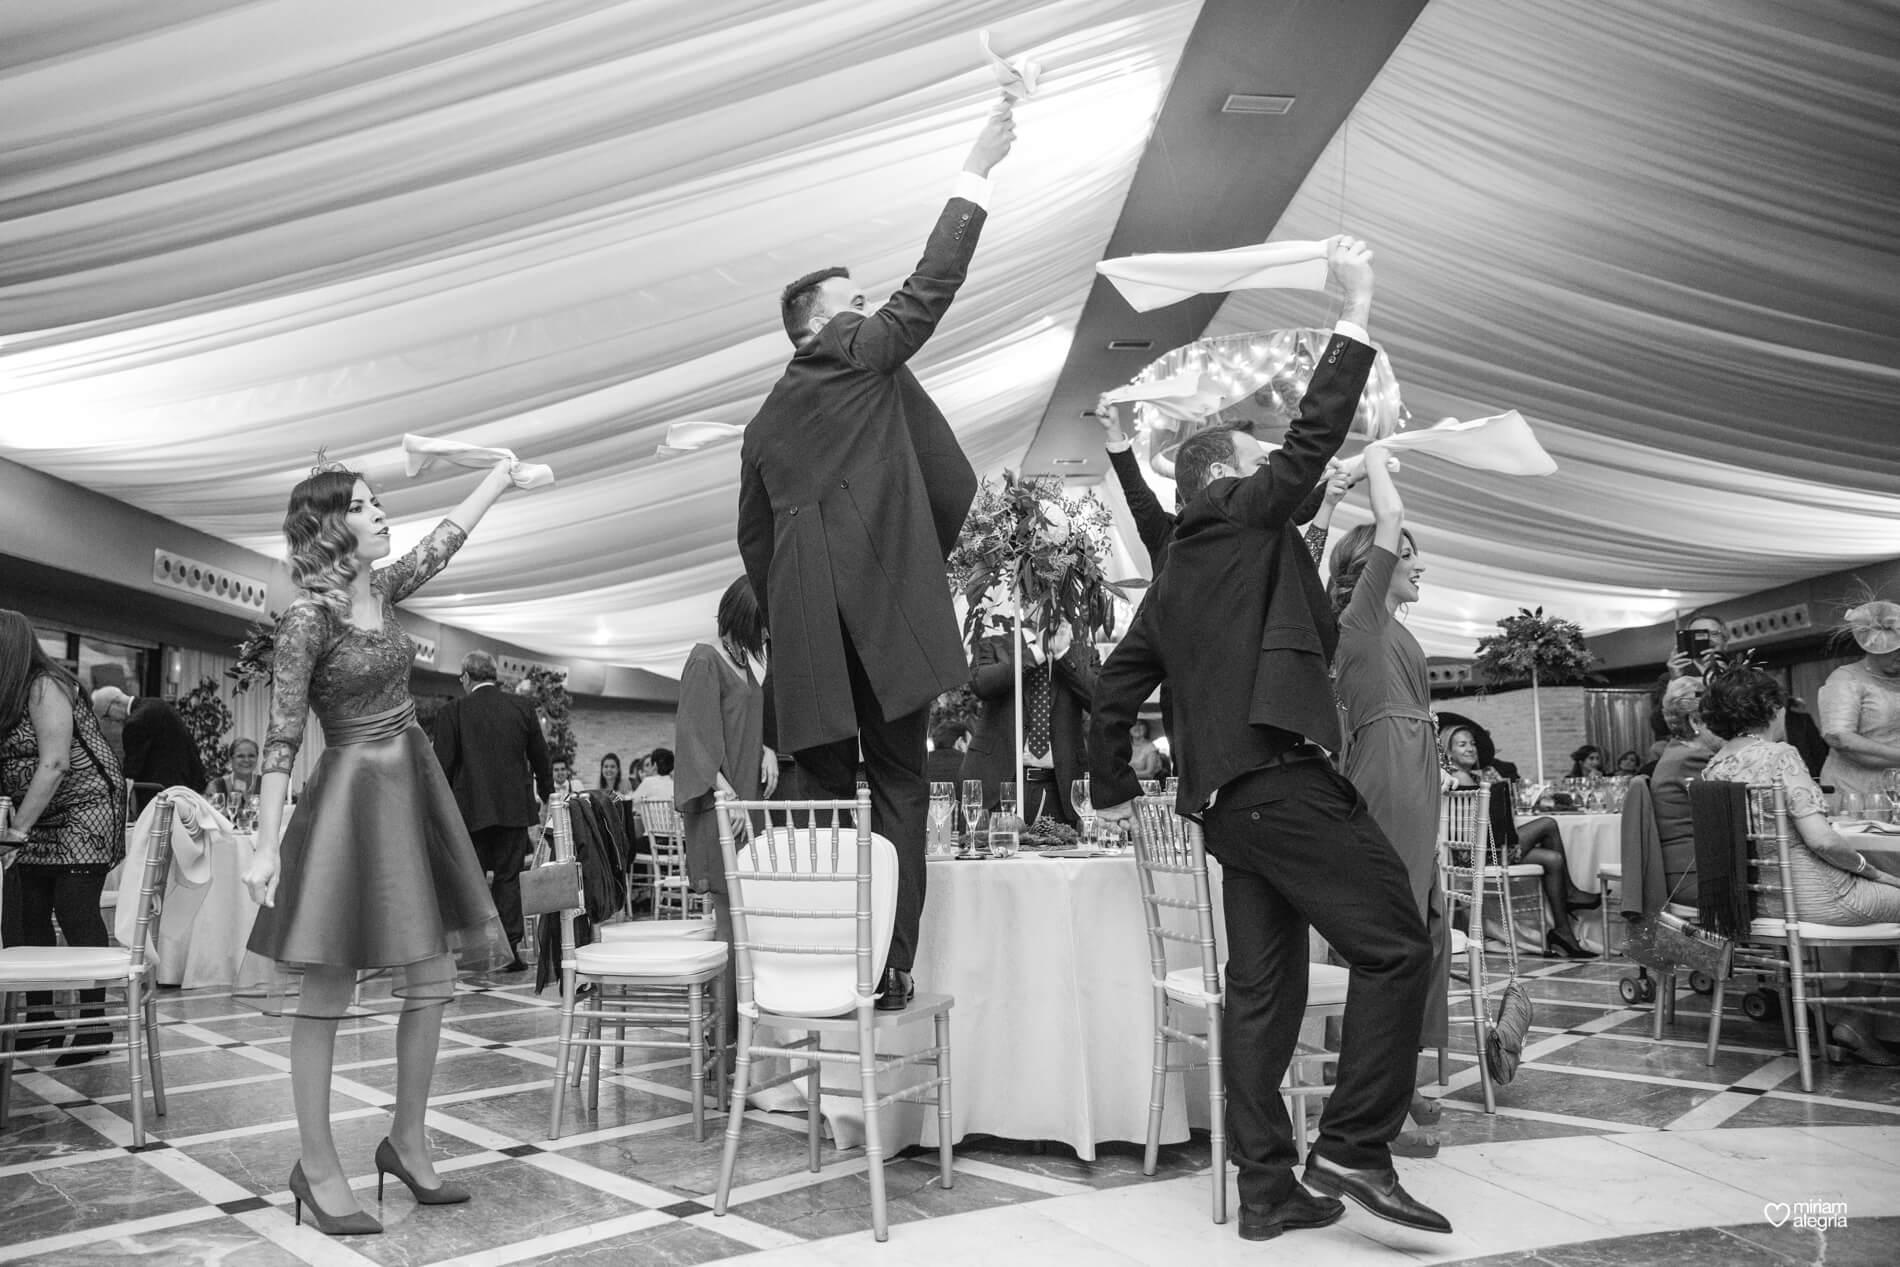 vestido-de-novia-paula-del-vas-miriam-alegria-fotografos-boda-murcia-126